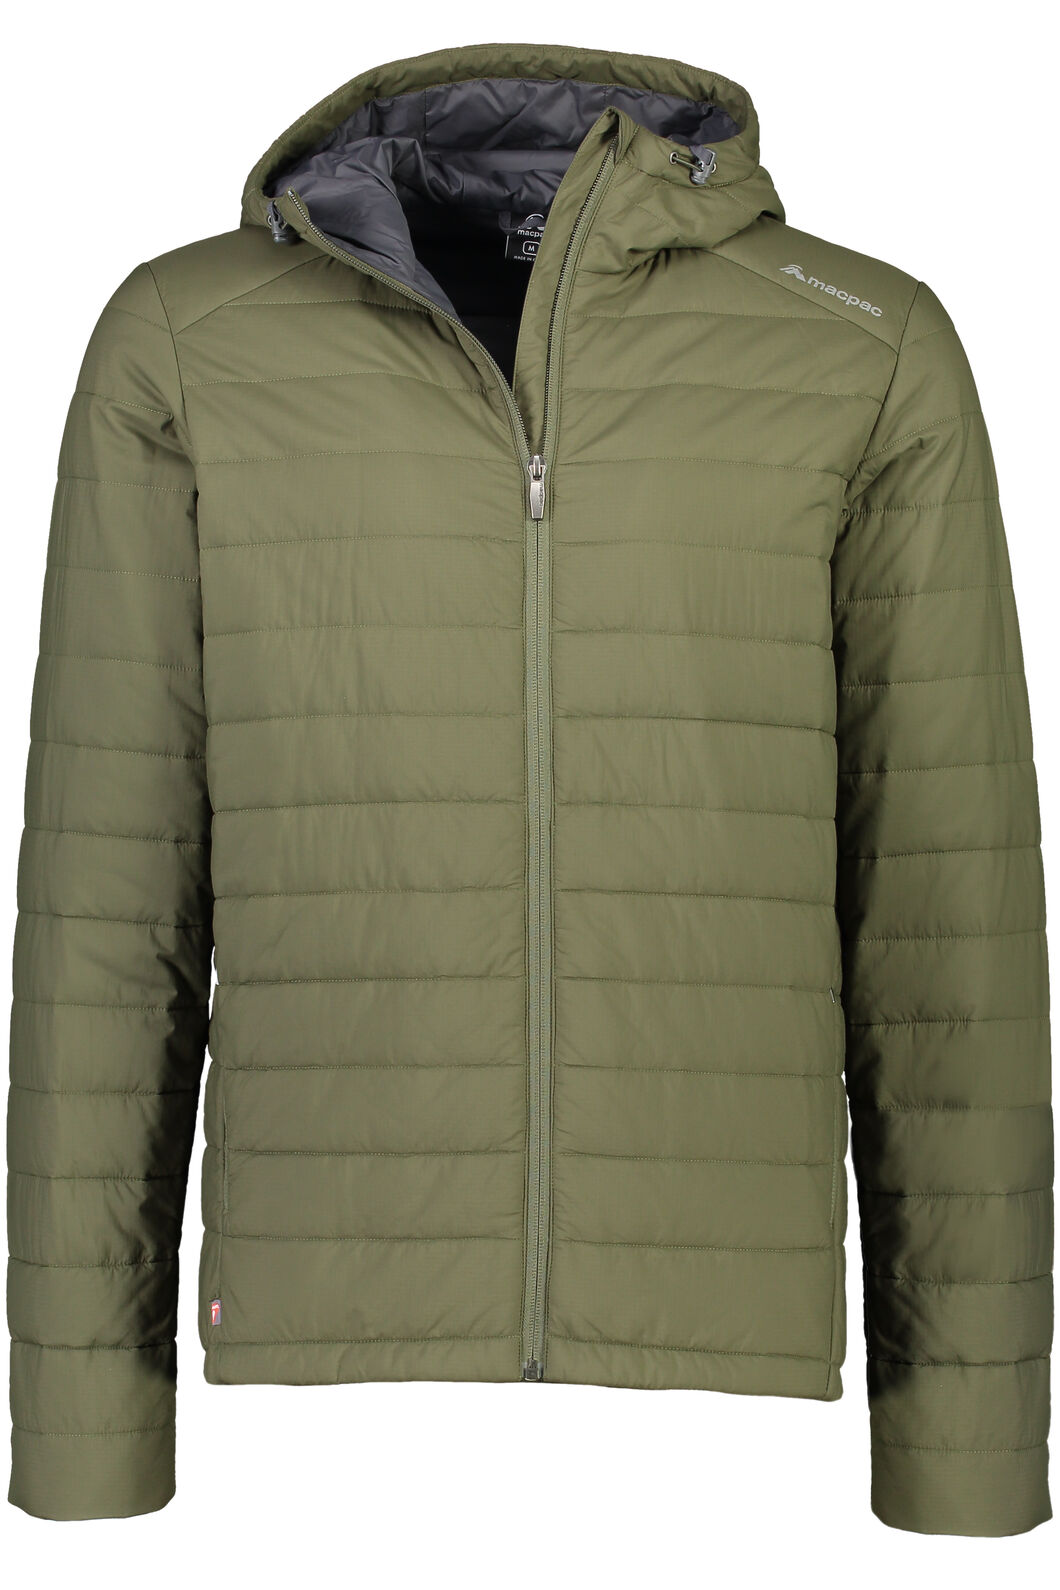 Macpac ETA PrimaLoft® Jacket - Men's, Grape Leaf, hi-res